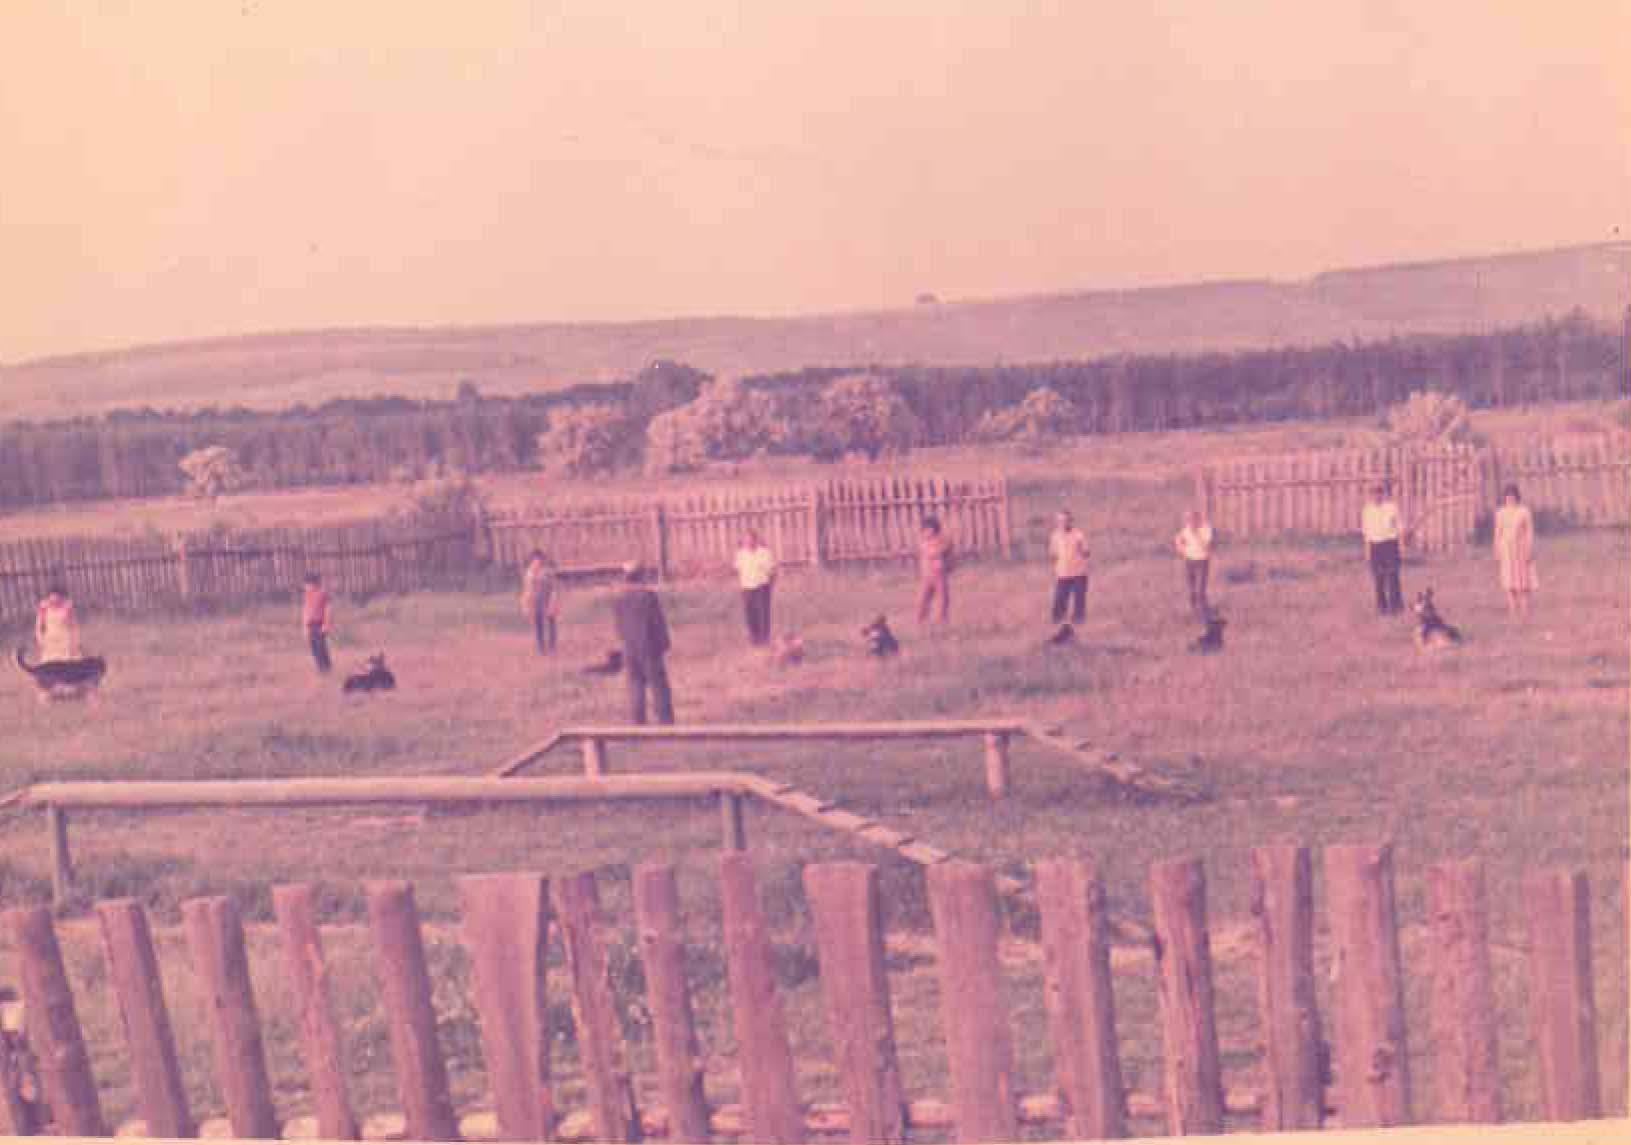 Вид на учебно-дрессировочную площадку клуба . Район 21 Линии